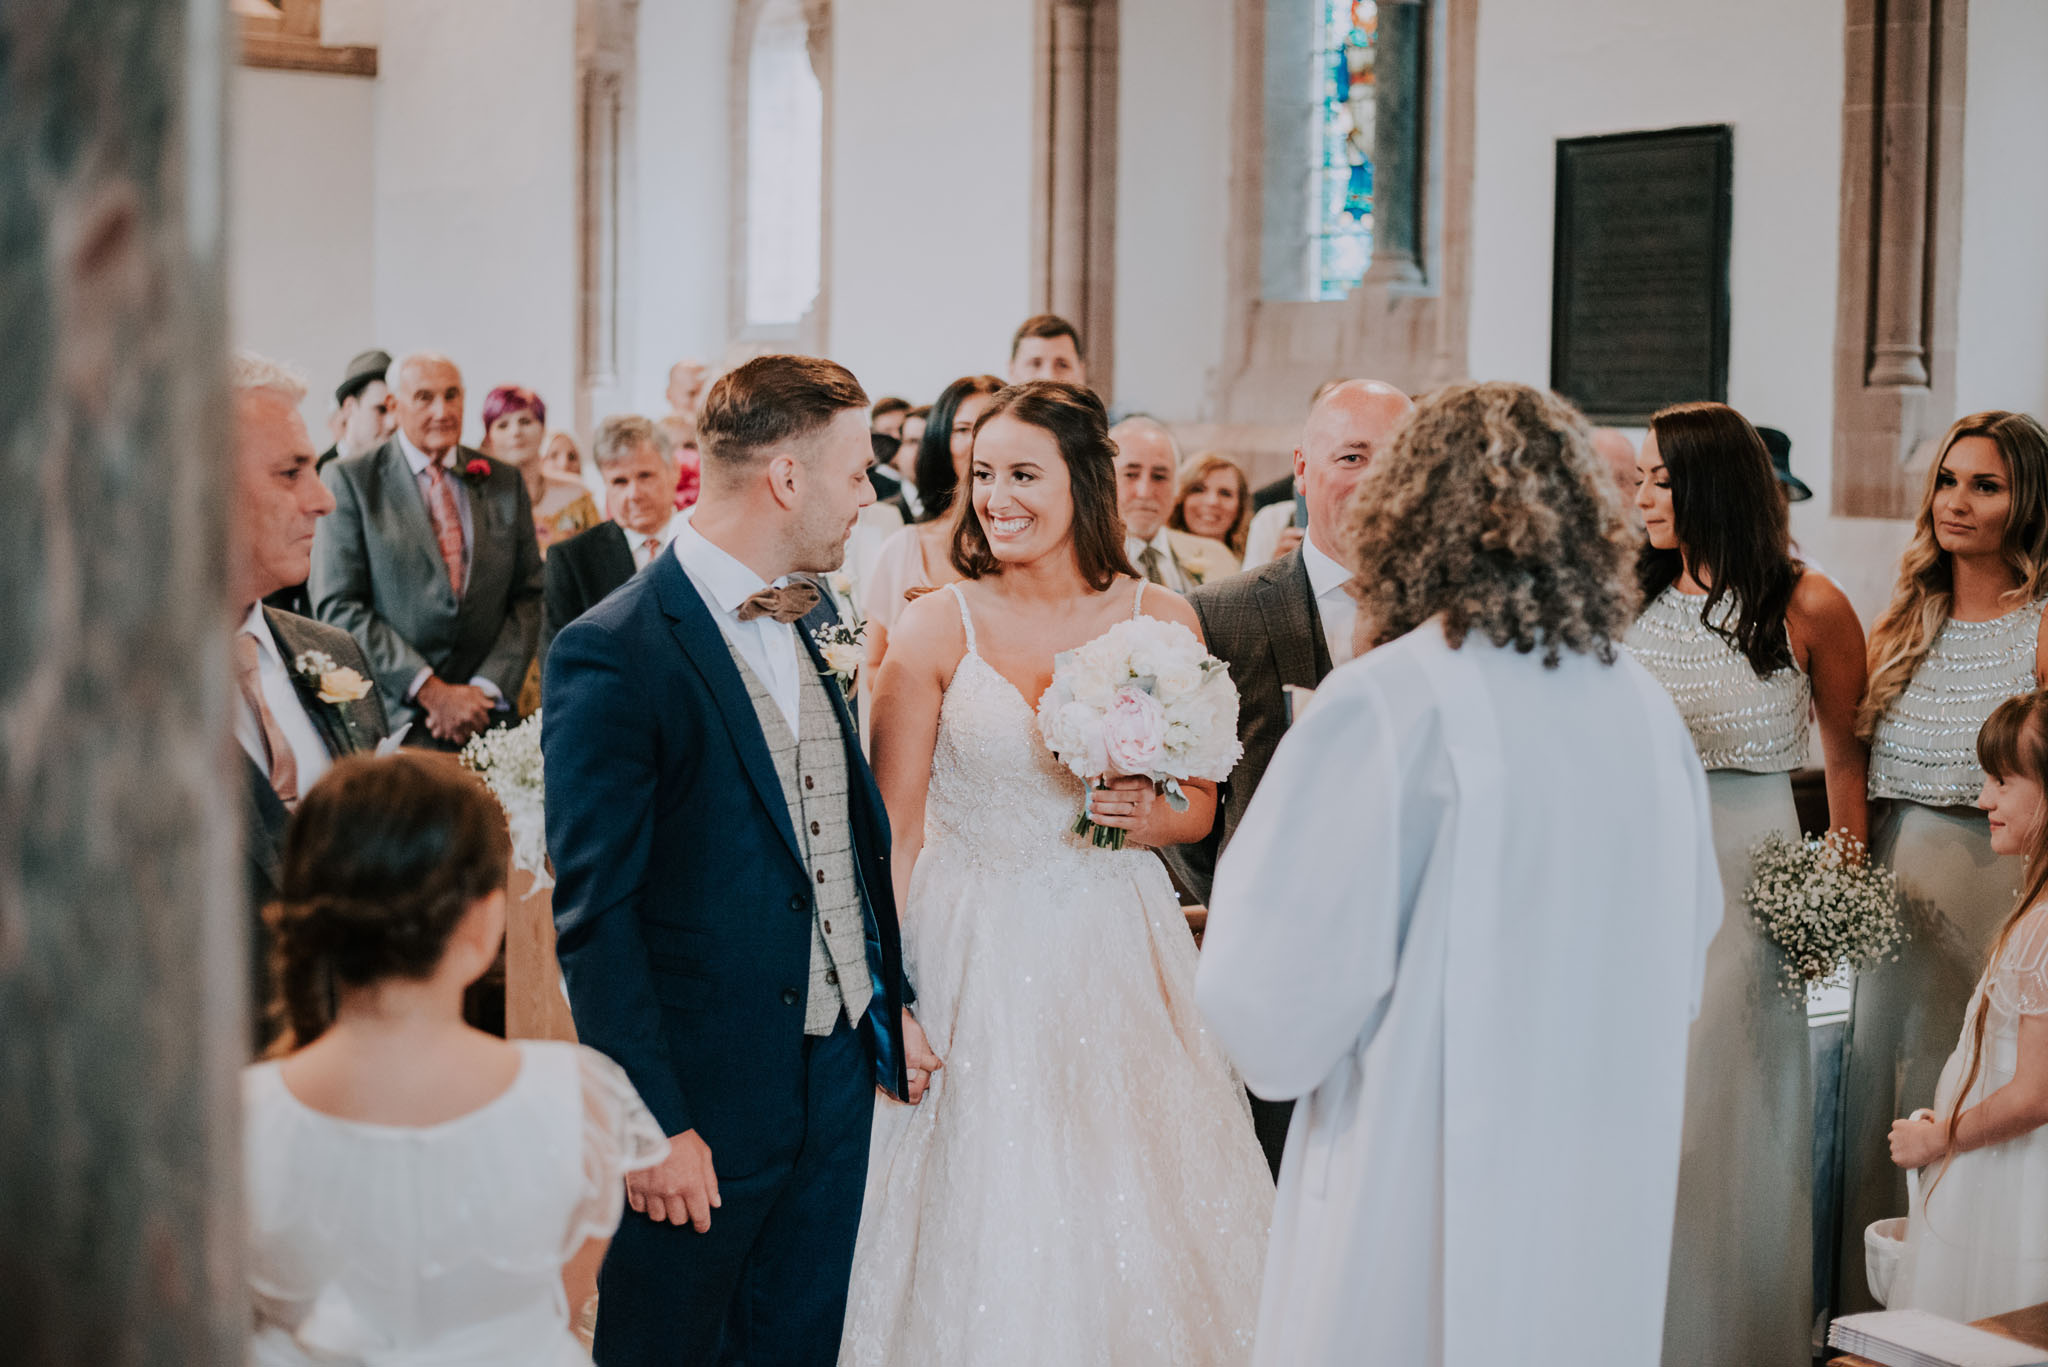 wedding-photographer-glewstone-court-hereford-scott-stockwell-photography171.jpg